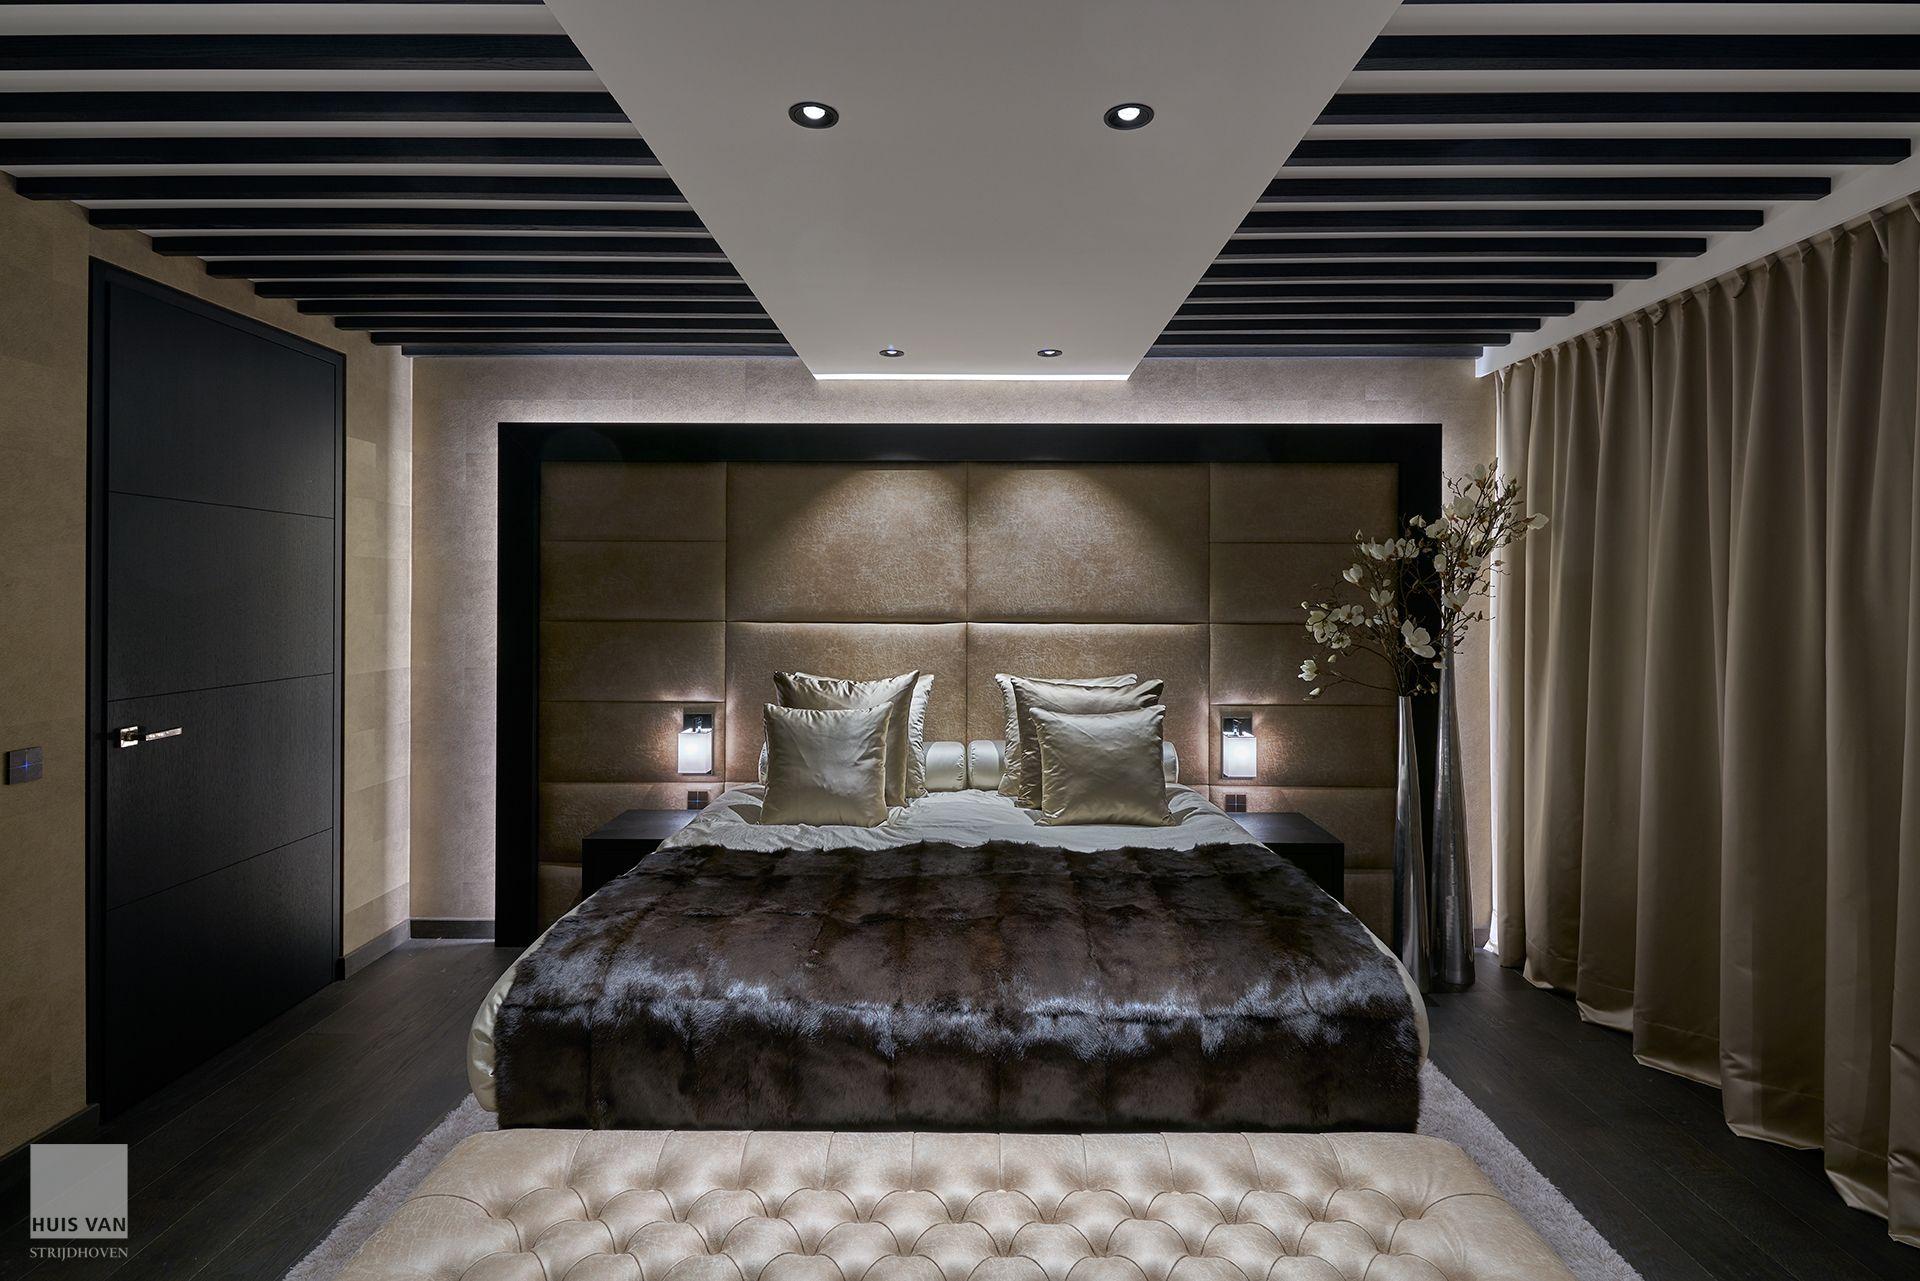 Luxury penthouse interior design houten vloer in slaapkamer houten